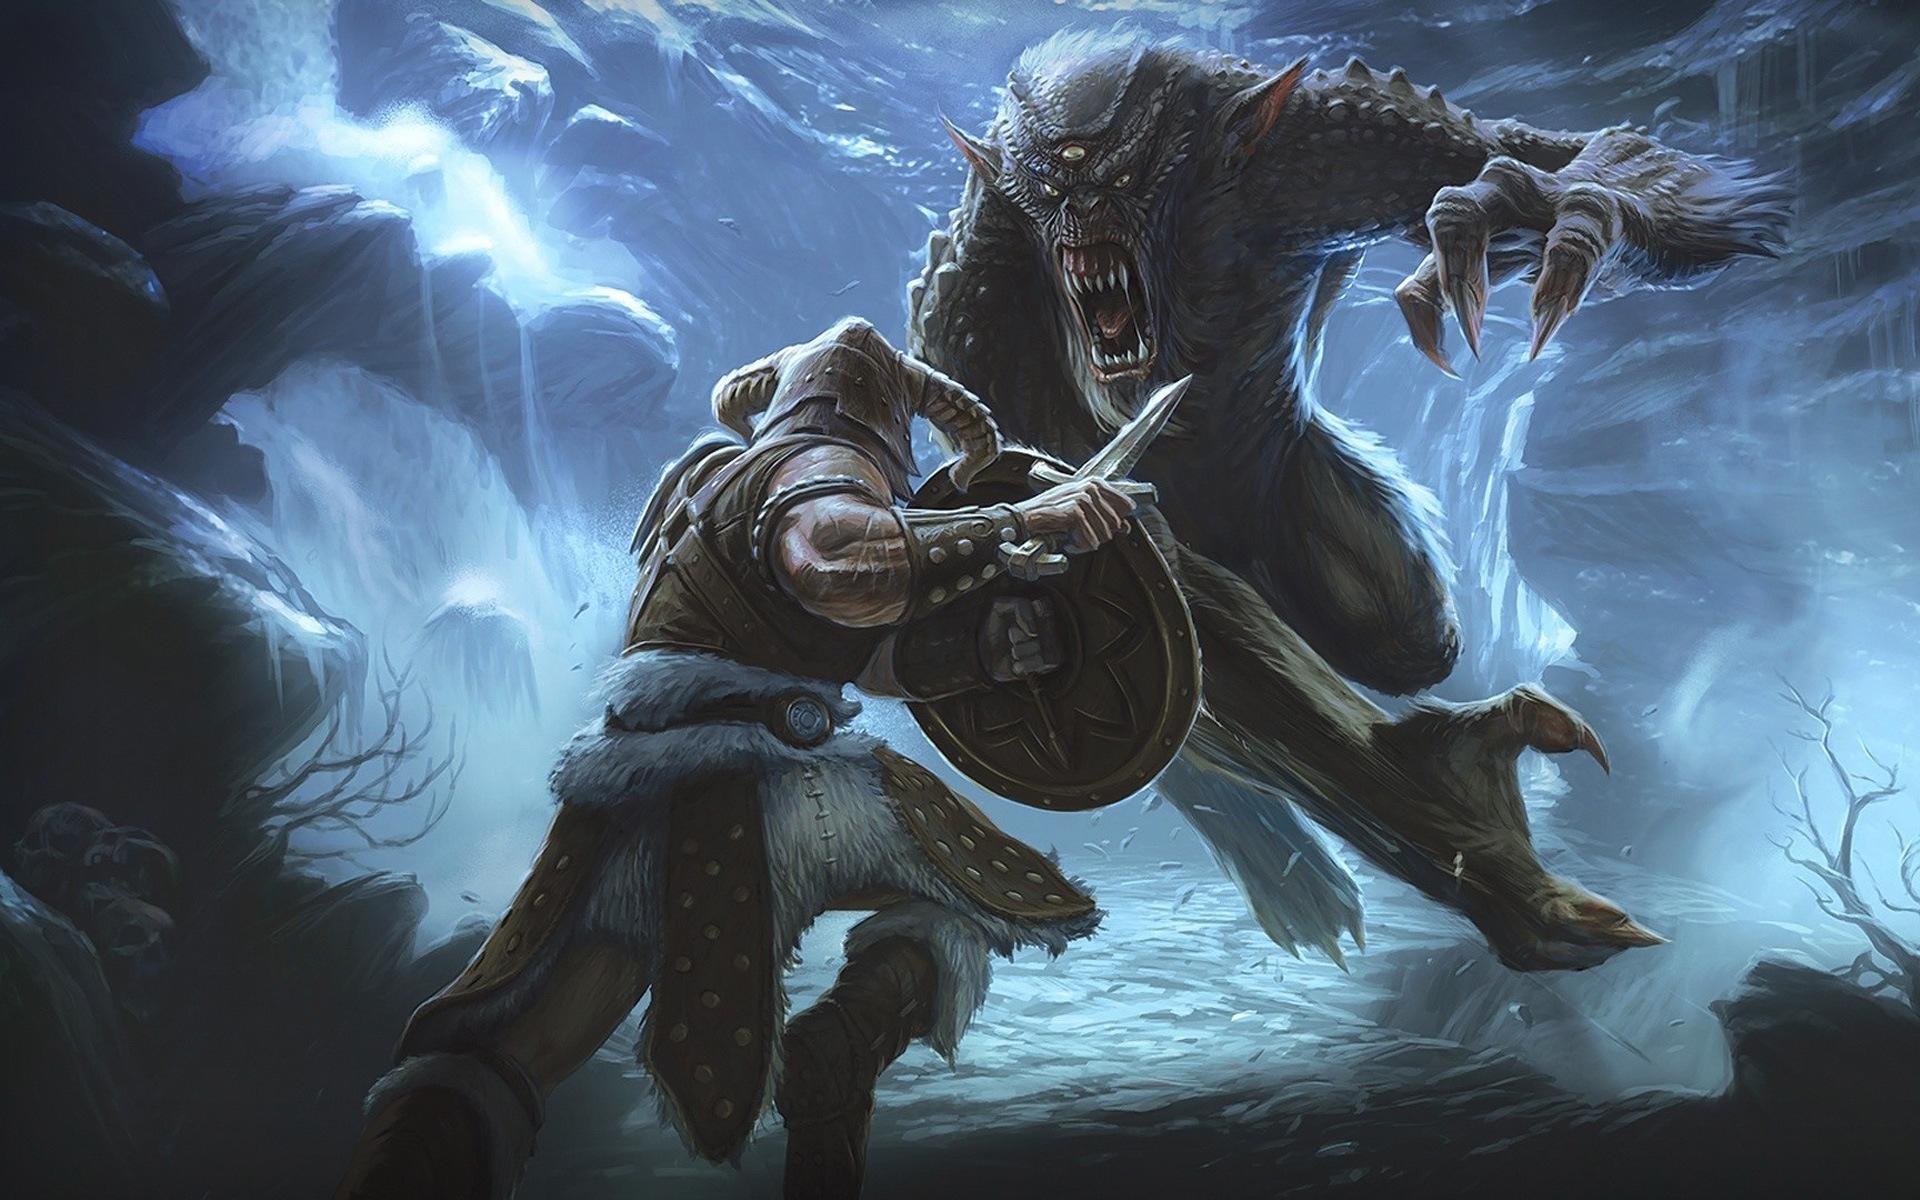 elder-scrolls-v-skyrim-fight-1920x1200.jpg